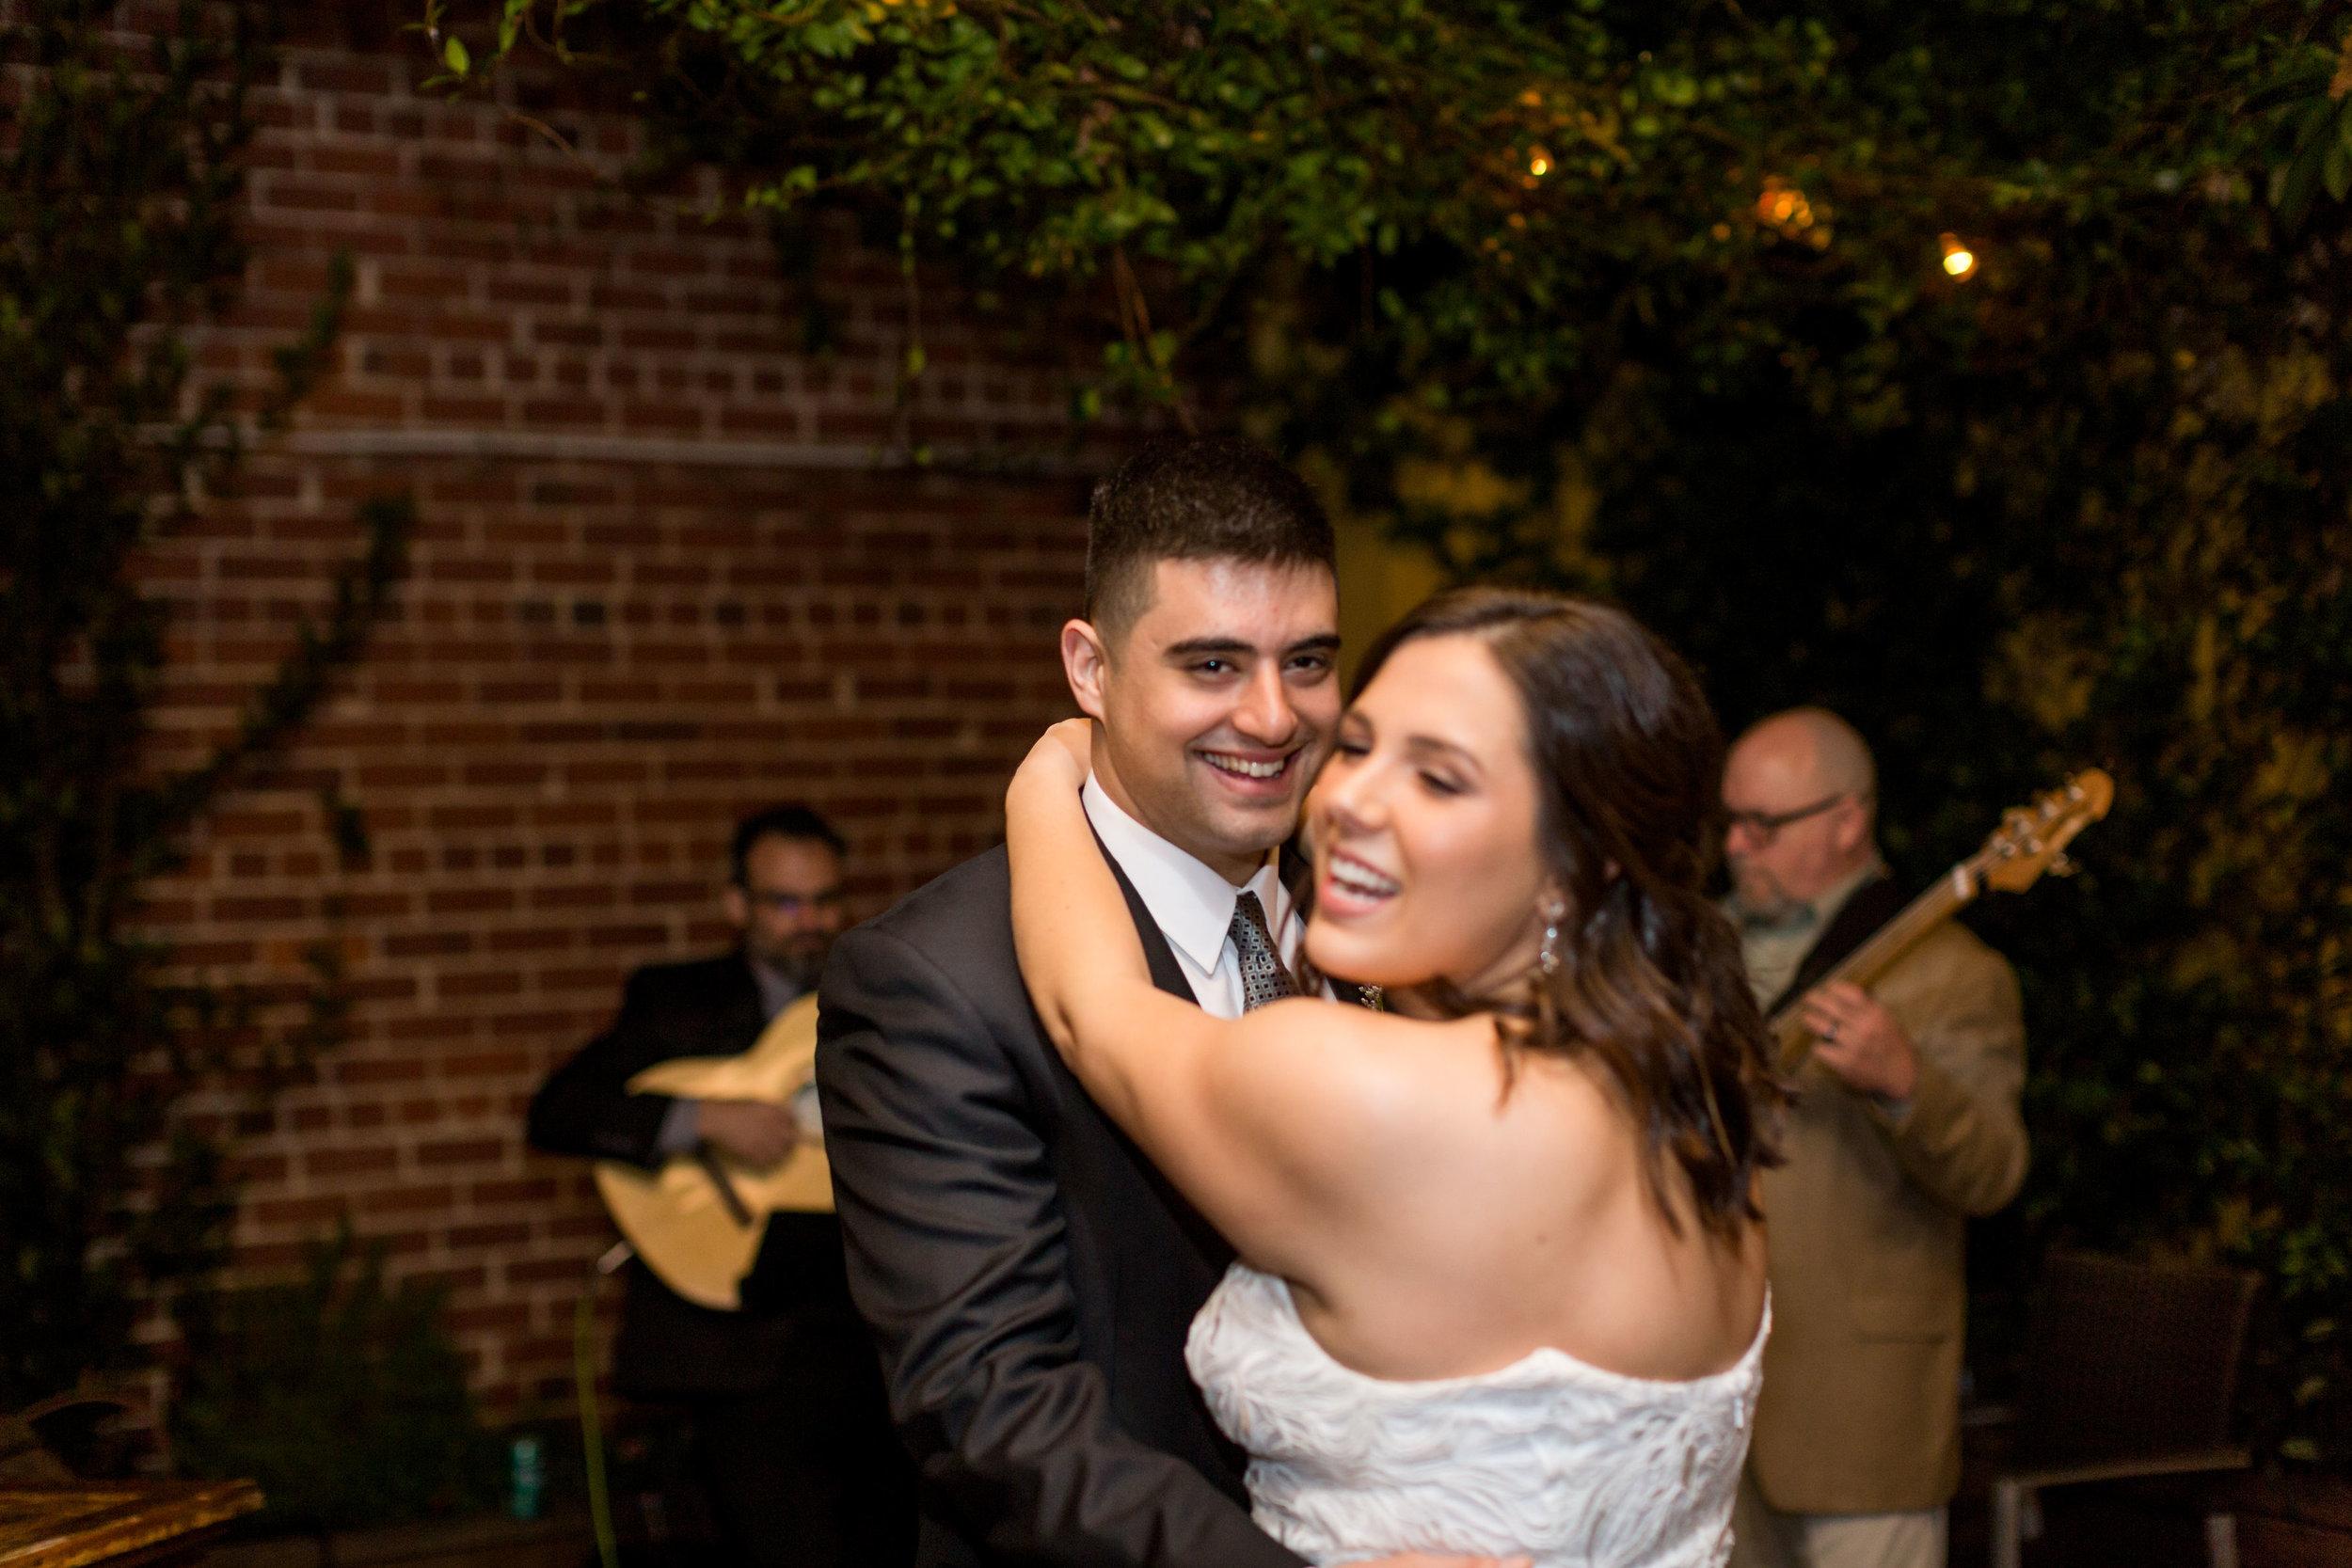 charleston new years elopement popup surprise wedding at upstairs at midtown - scarlet plan & design wedding planners (361).jpg